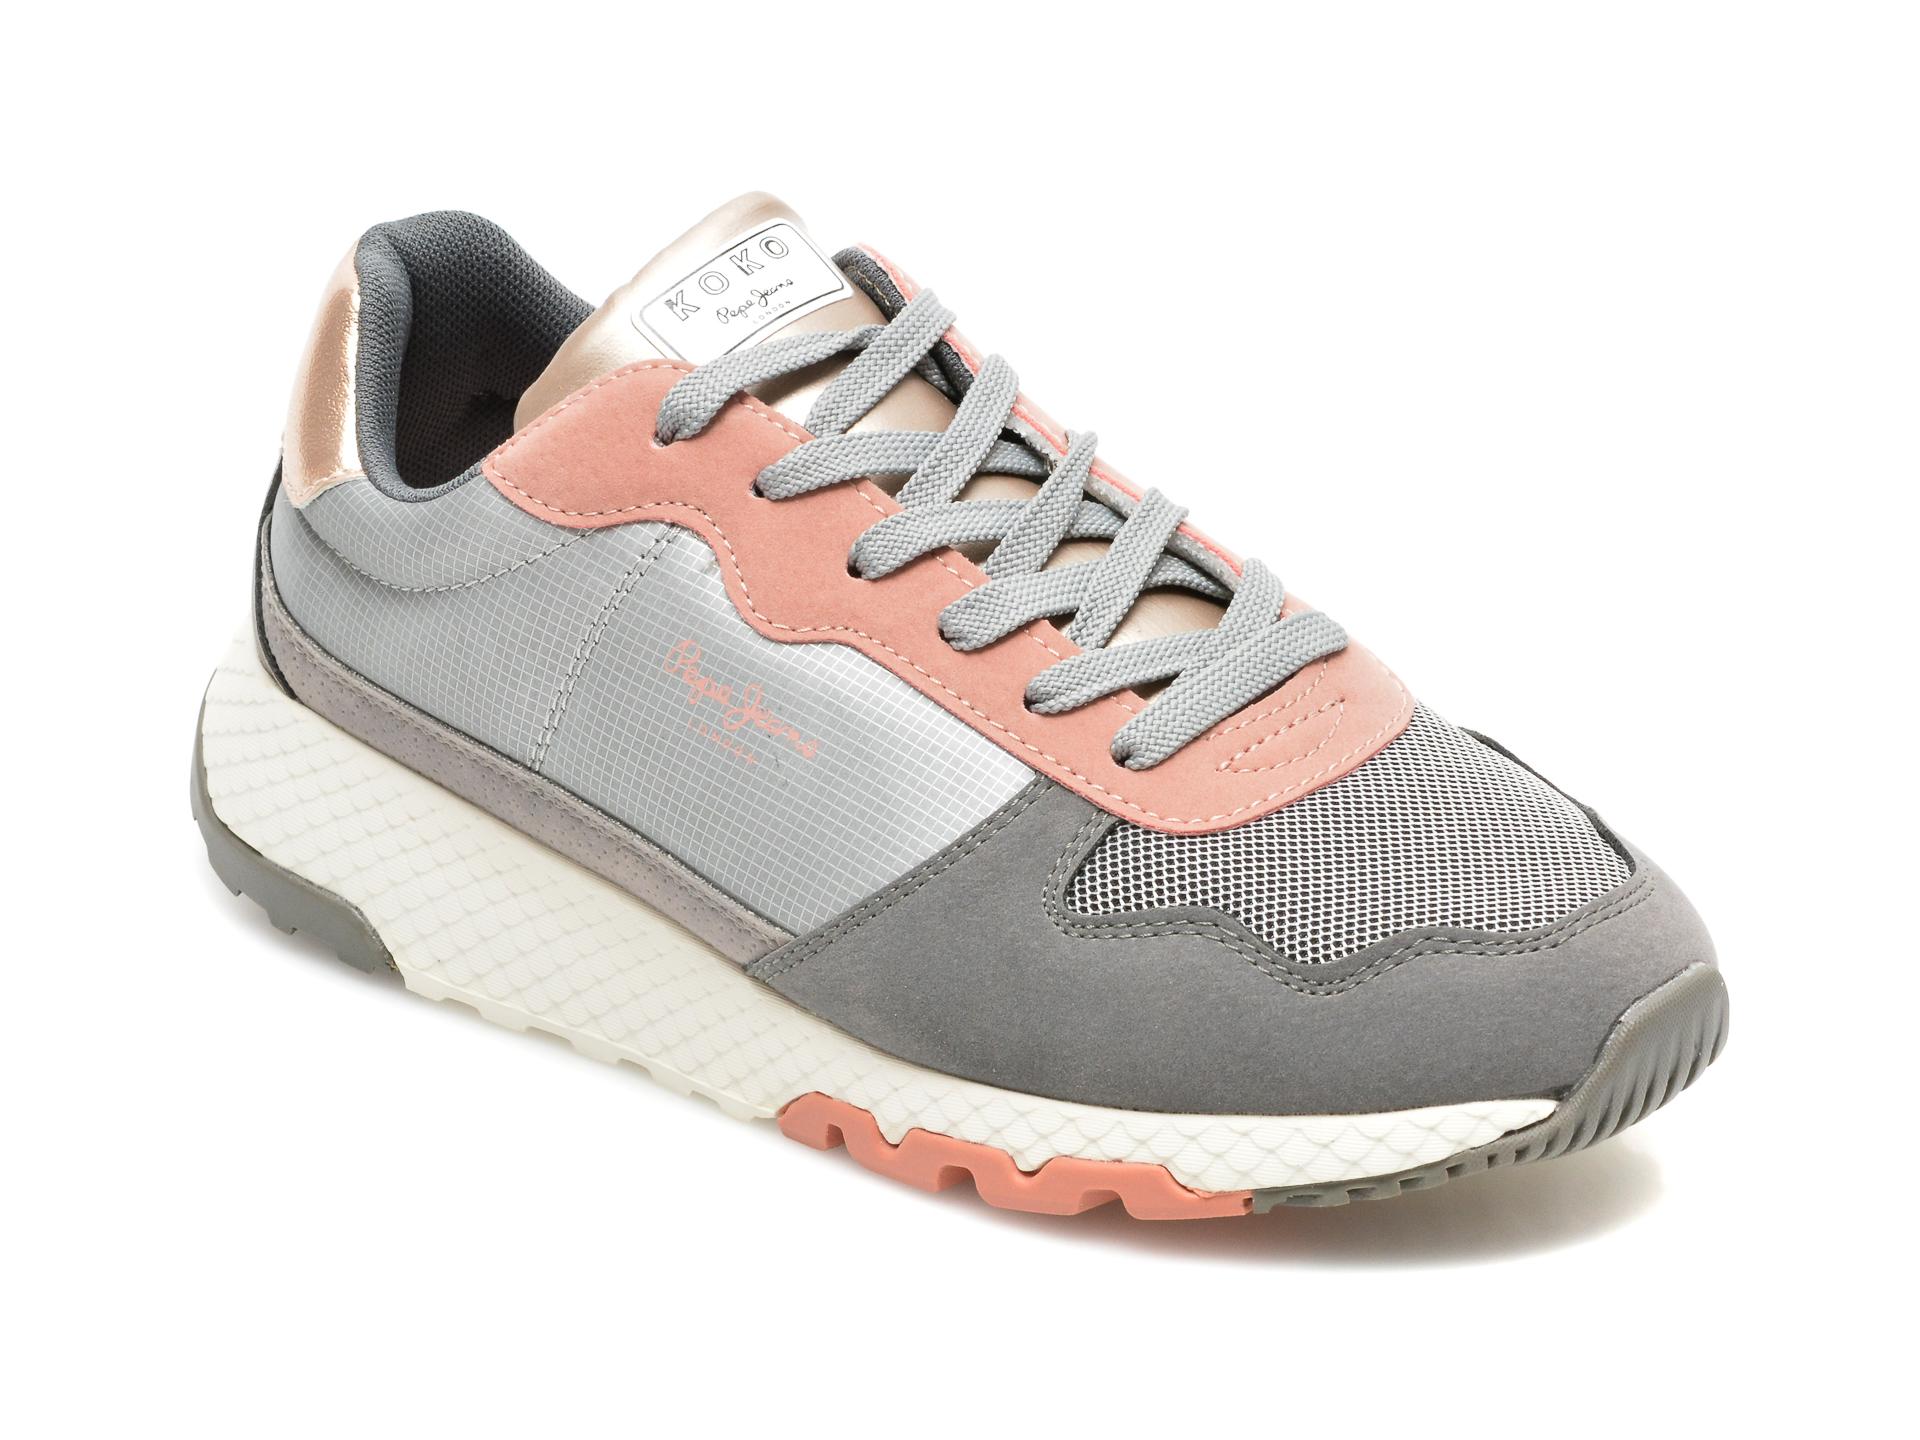 Pantofi sport PEPE JEANS gri, LS31242, din material textil si piele ecologica